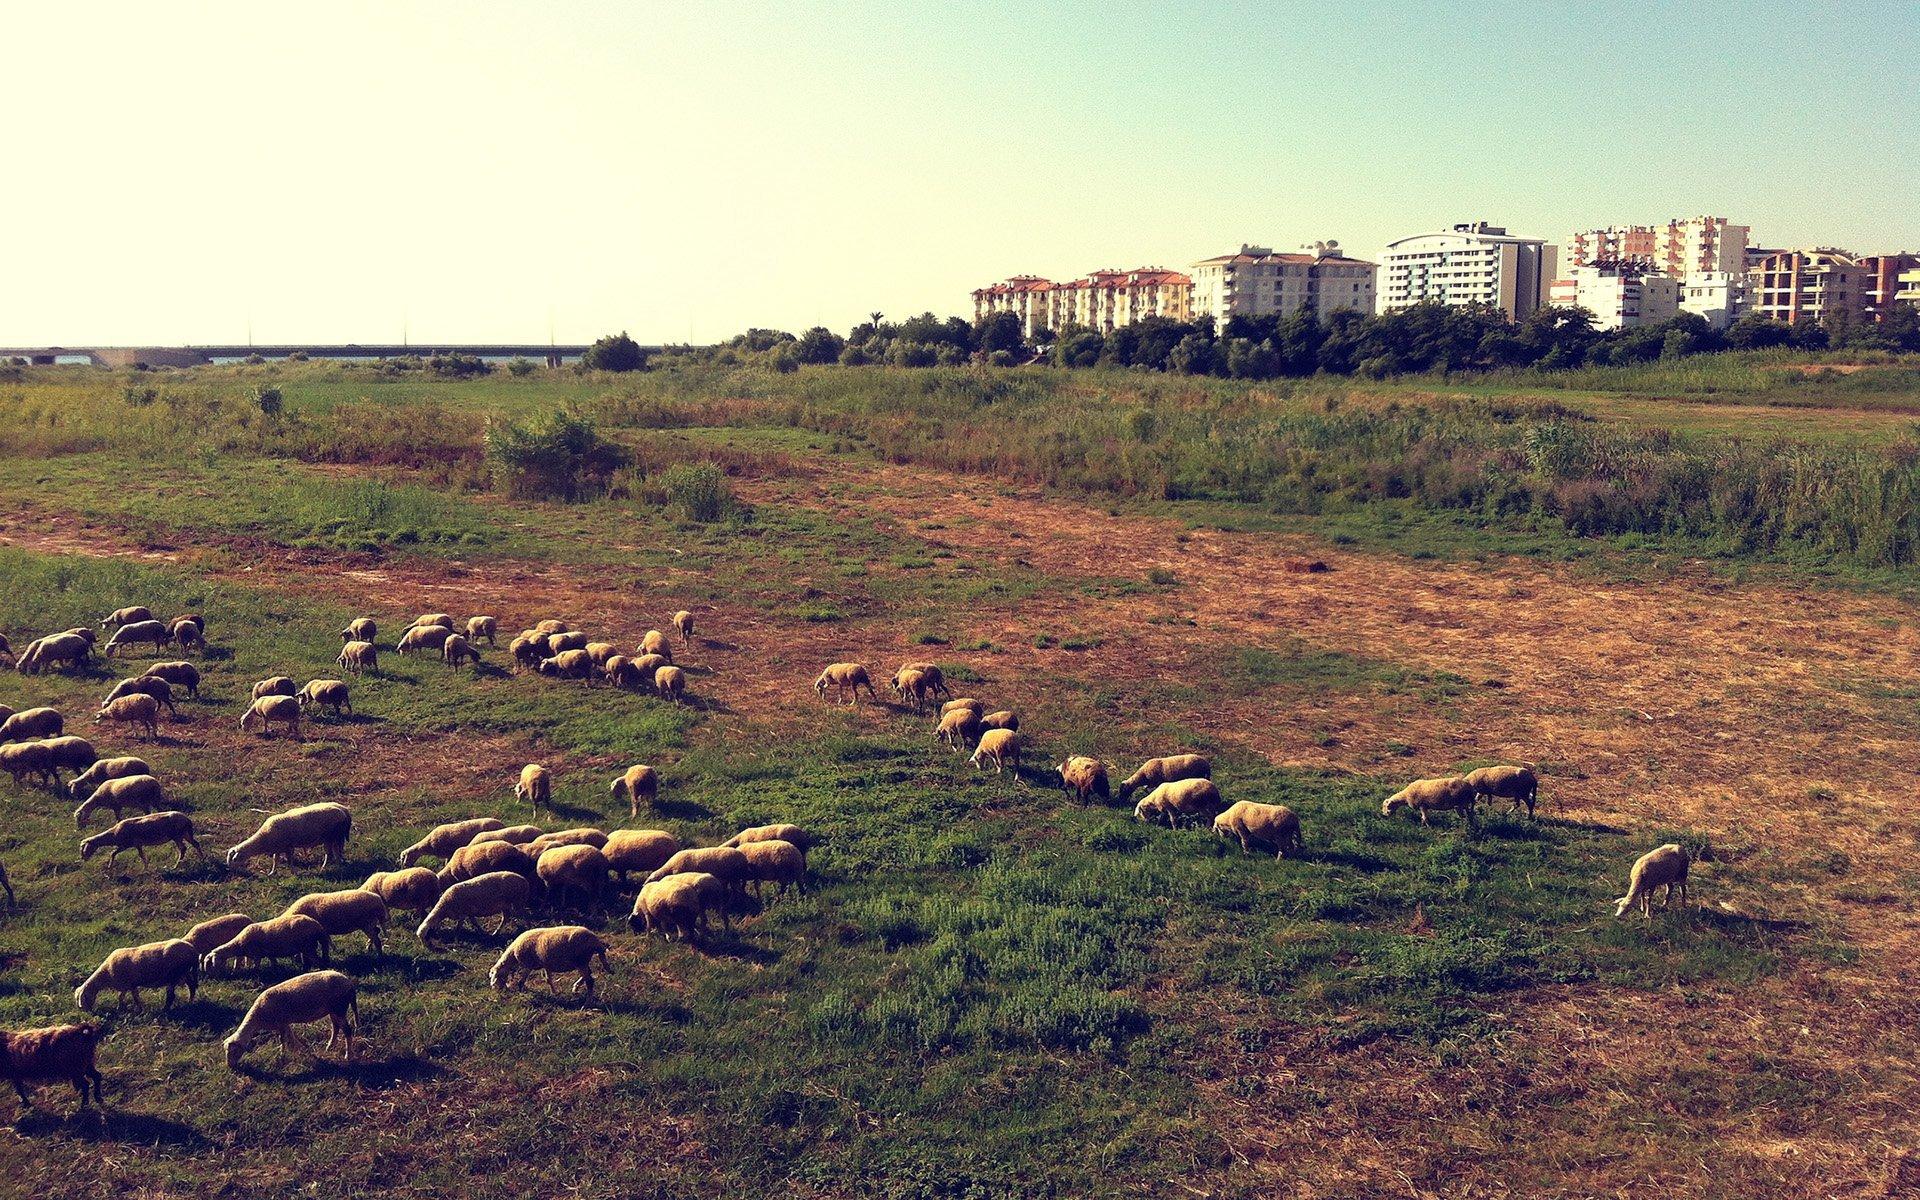 antalya koyunlar